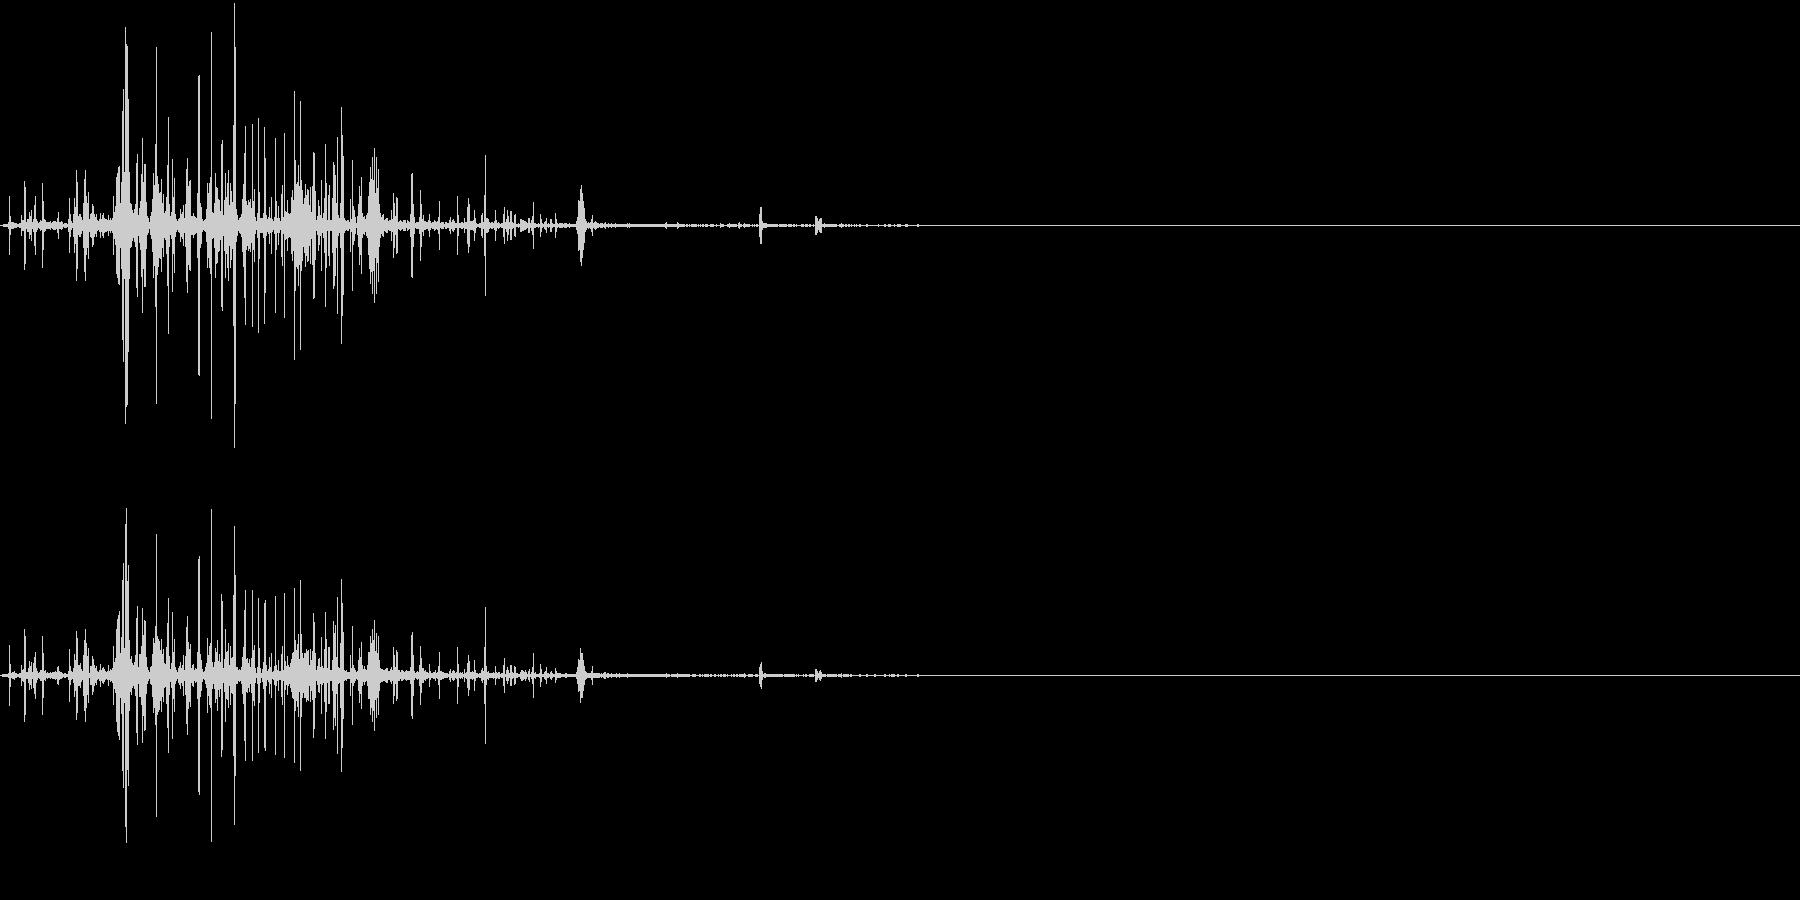 TsubureFX 内臓が潰れる音 2の未再生の波形